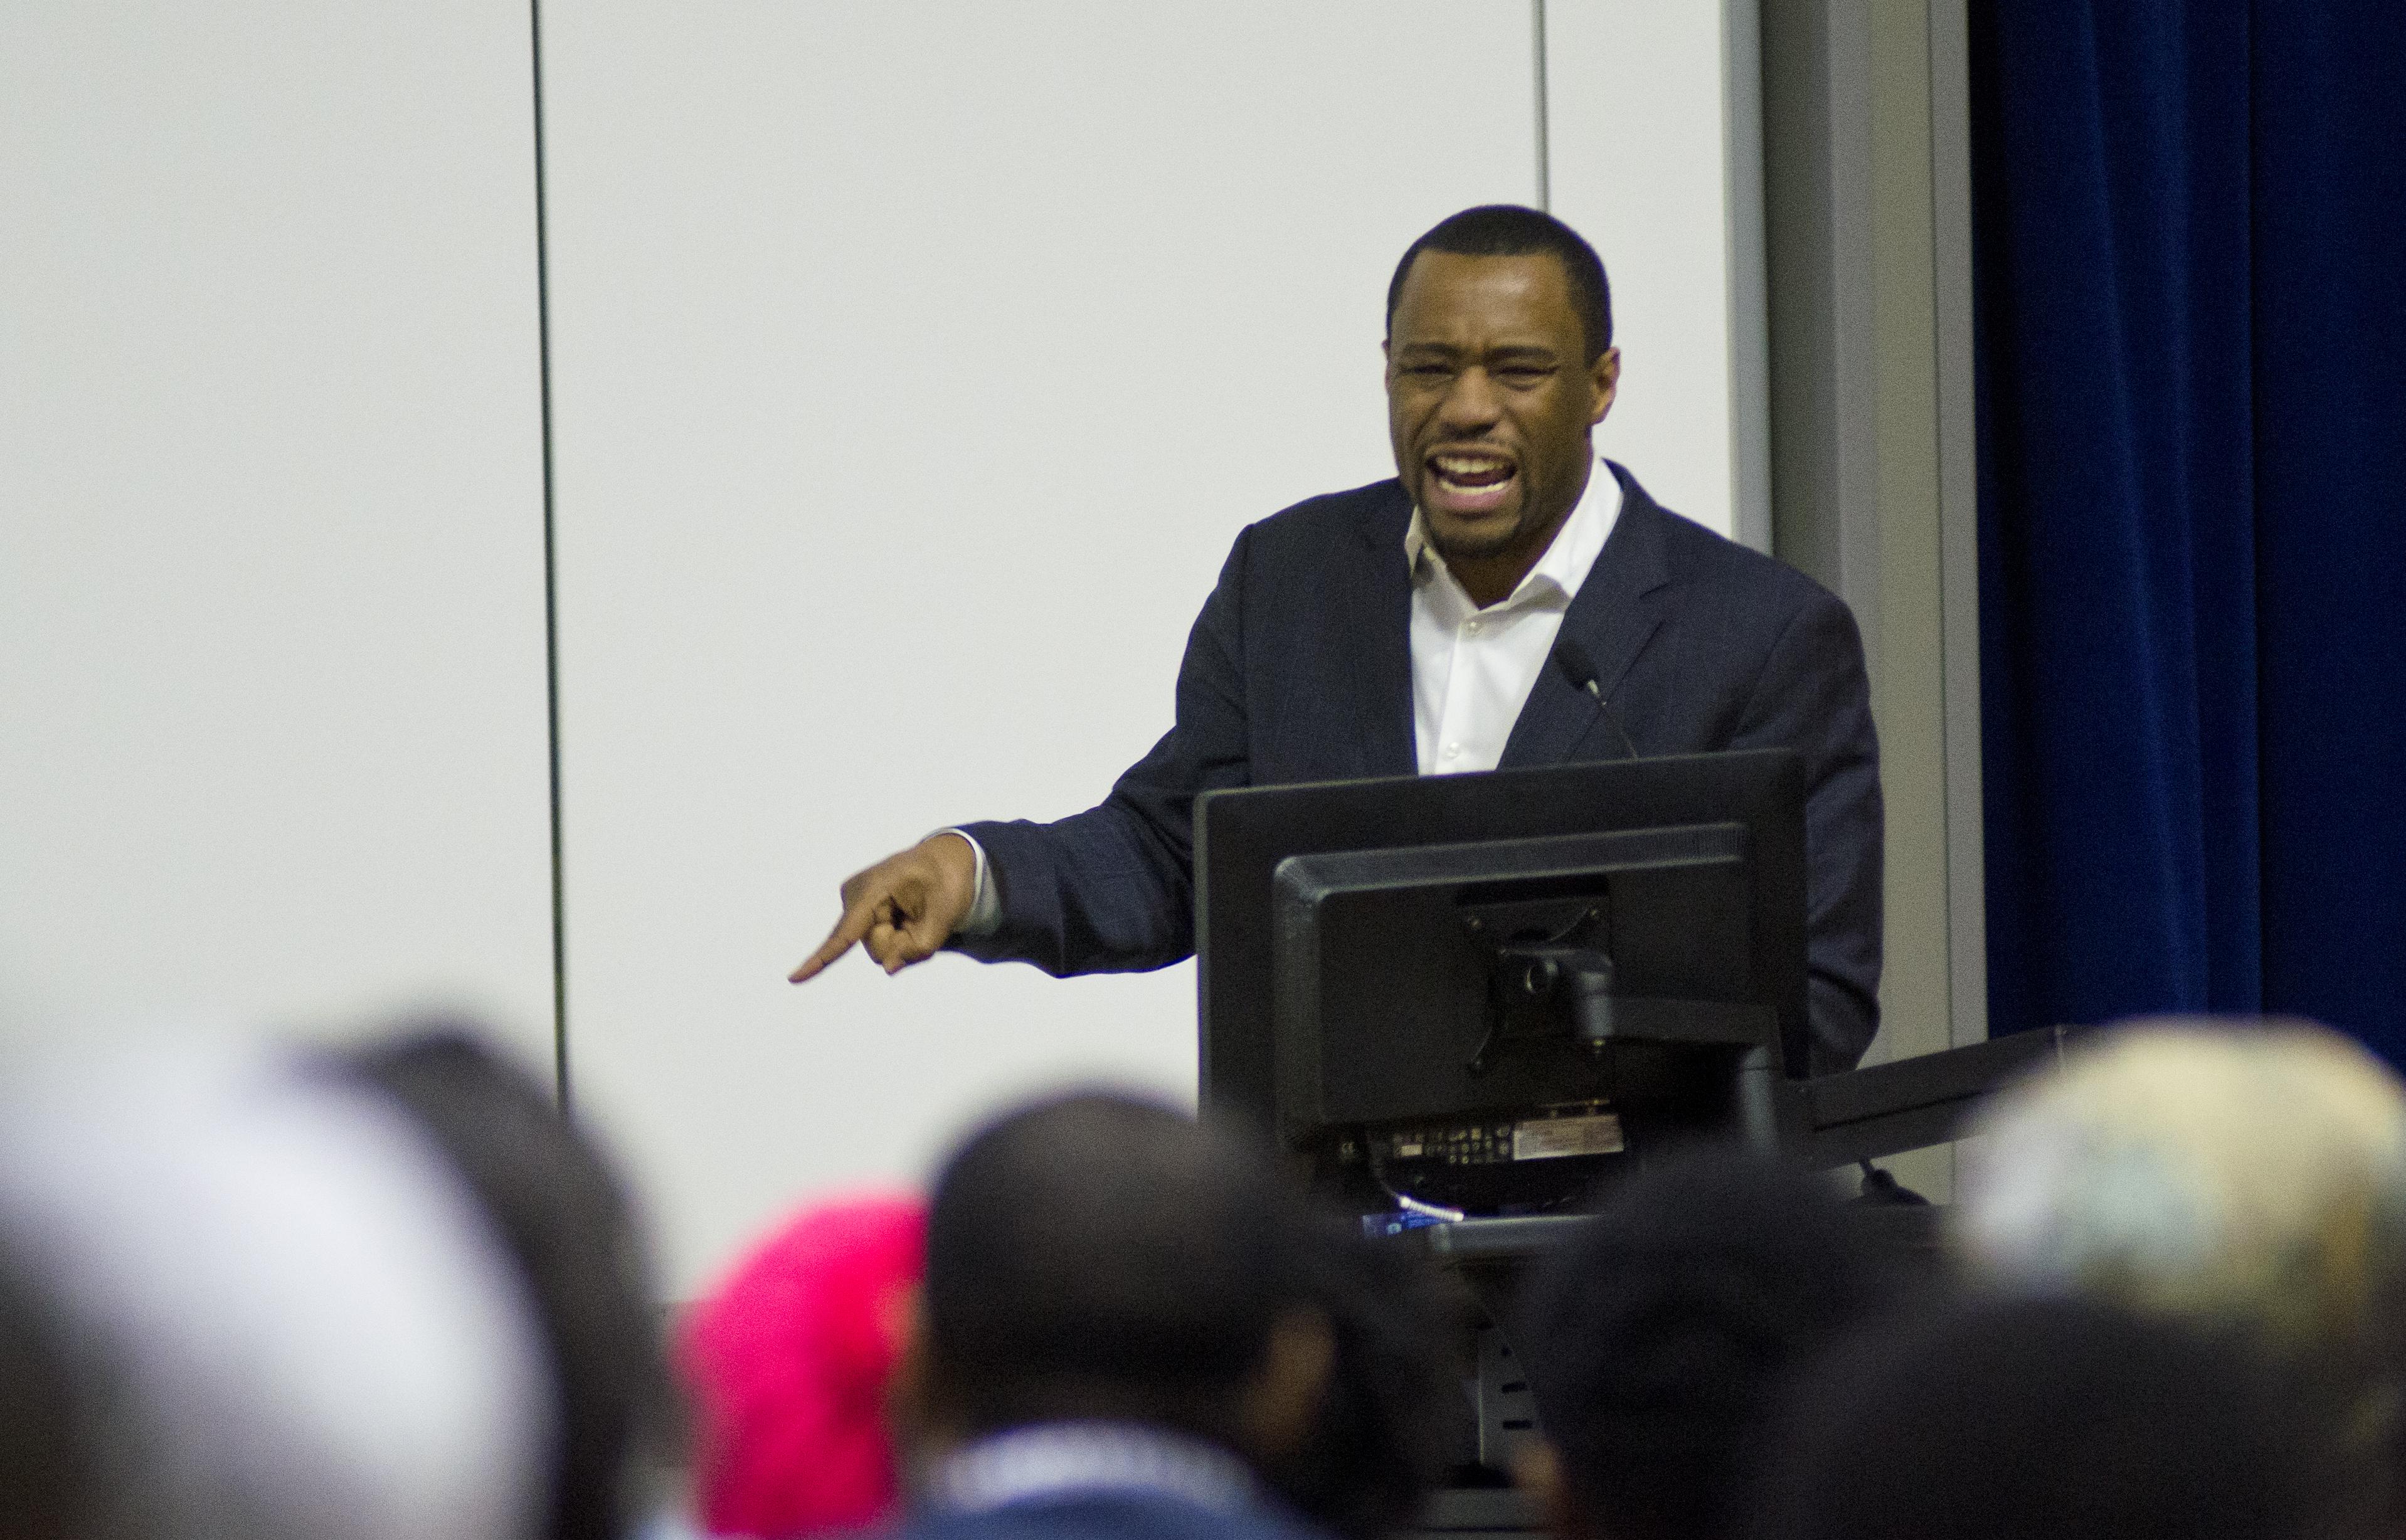 BSA hosts Dr. Marc Lamont Hill